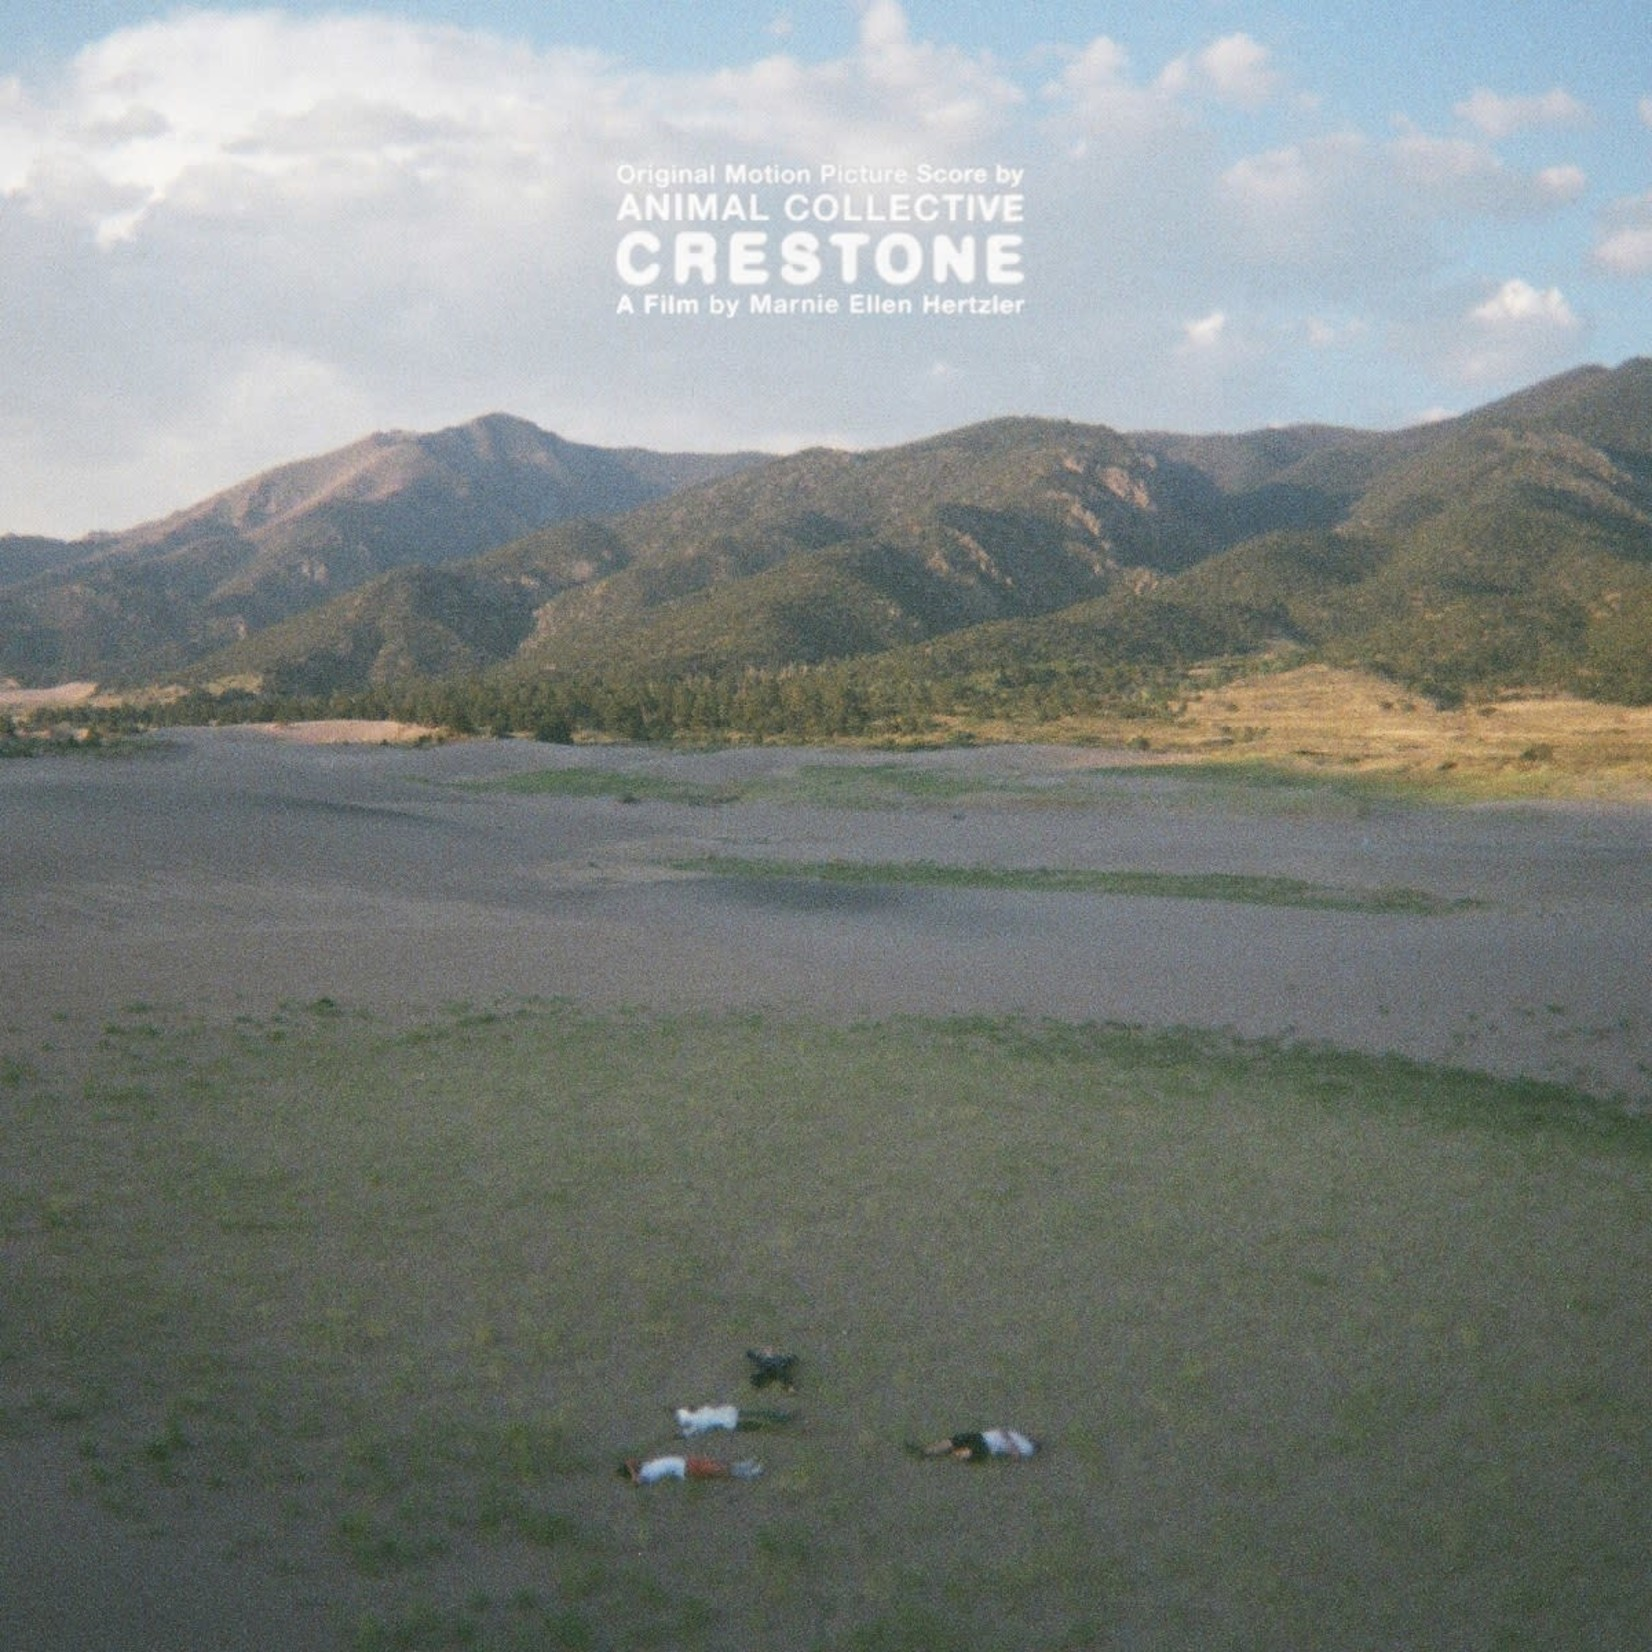 [New] Animal Collective: Crestone (soundtrack)